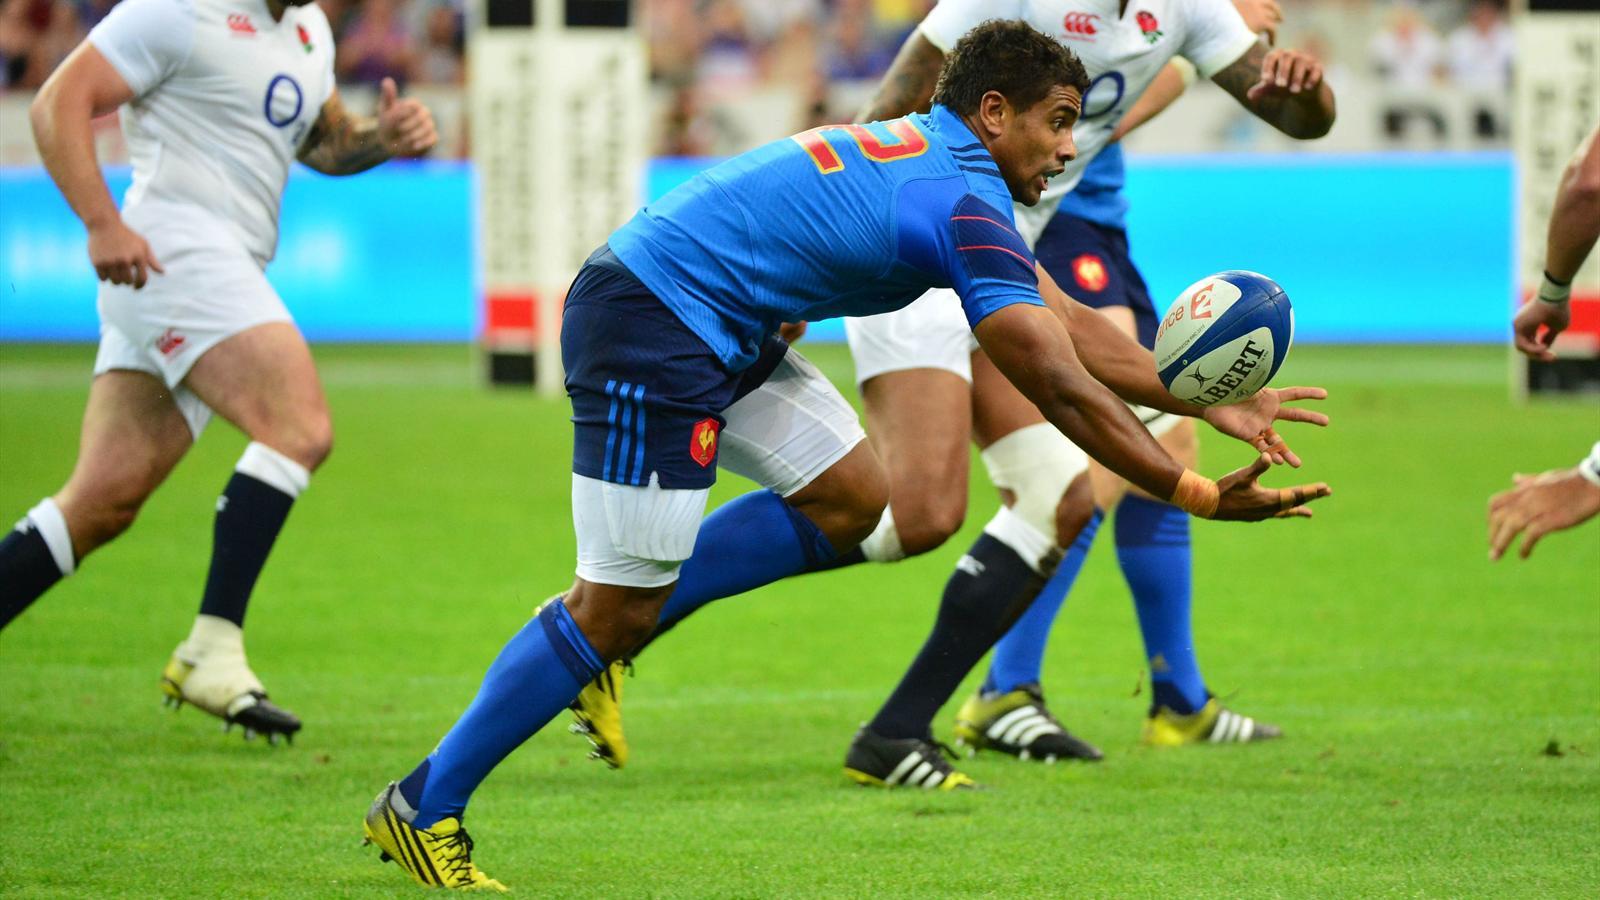 Wesley Fofana (XV de France) face à l'Angleterre - 22 août 2015